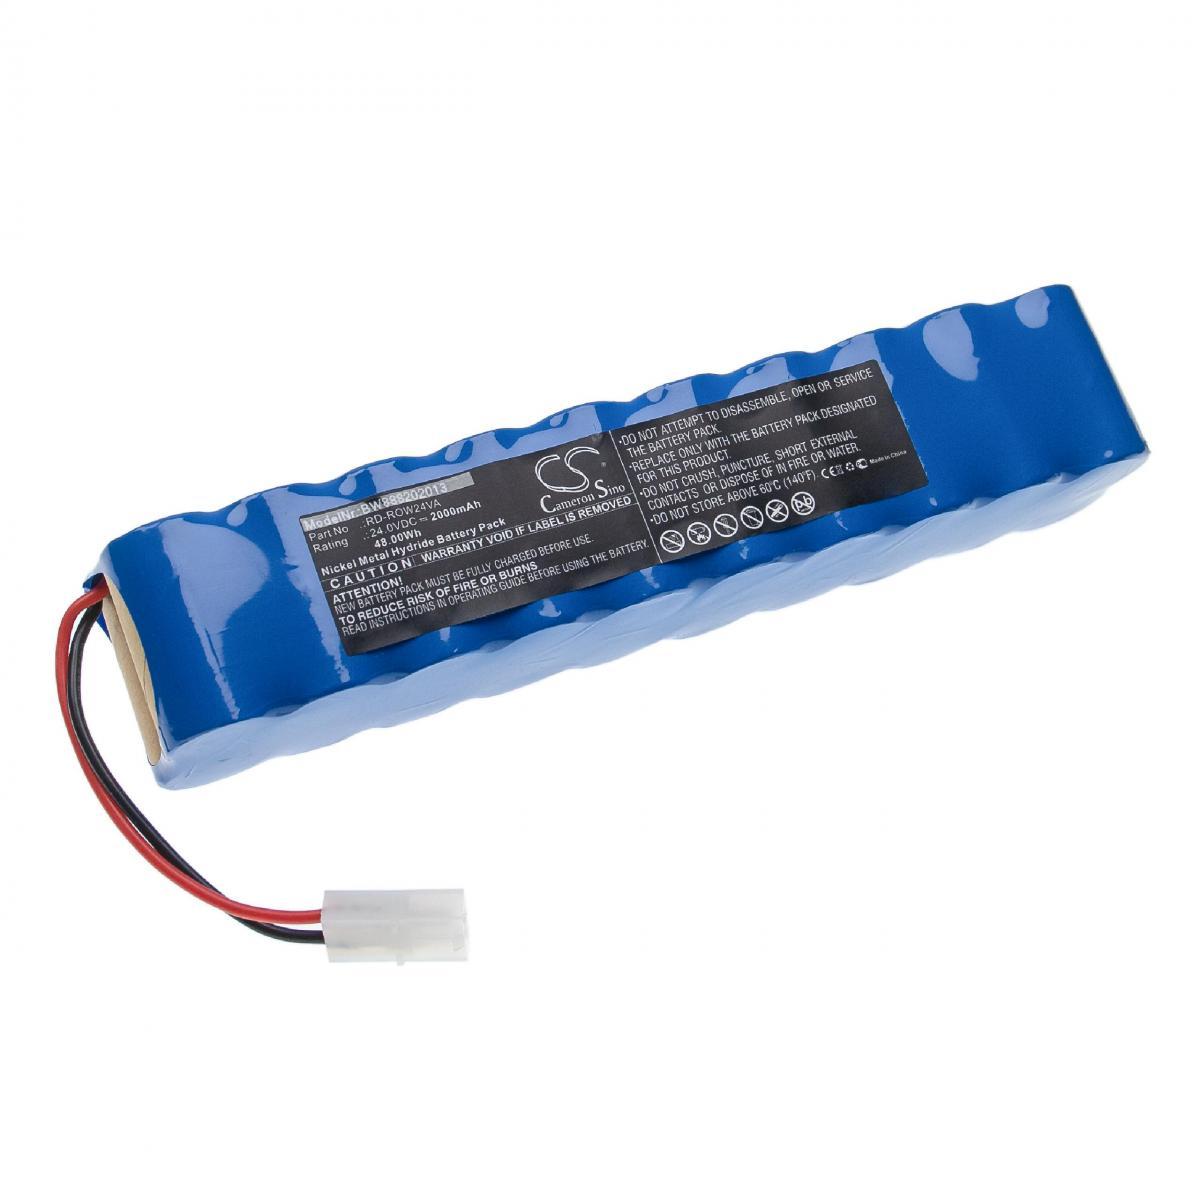 Vhbw vhbw batterie compatible avec Rowenta Air Force Extreme RH8872, RH8872WO/2D2 aspirateur Home Cleaner (2000mAh, 24V, NiMH